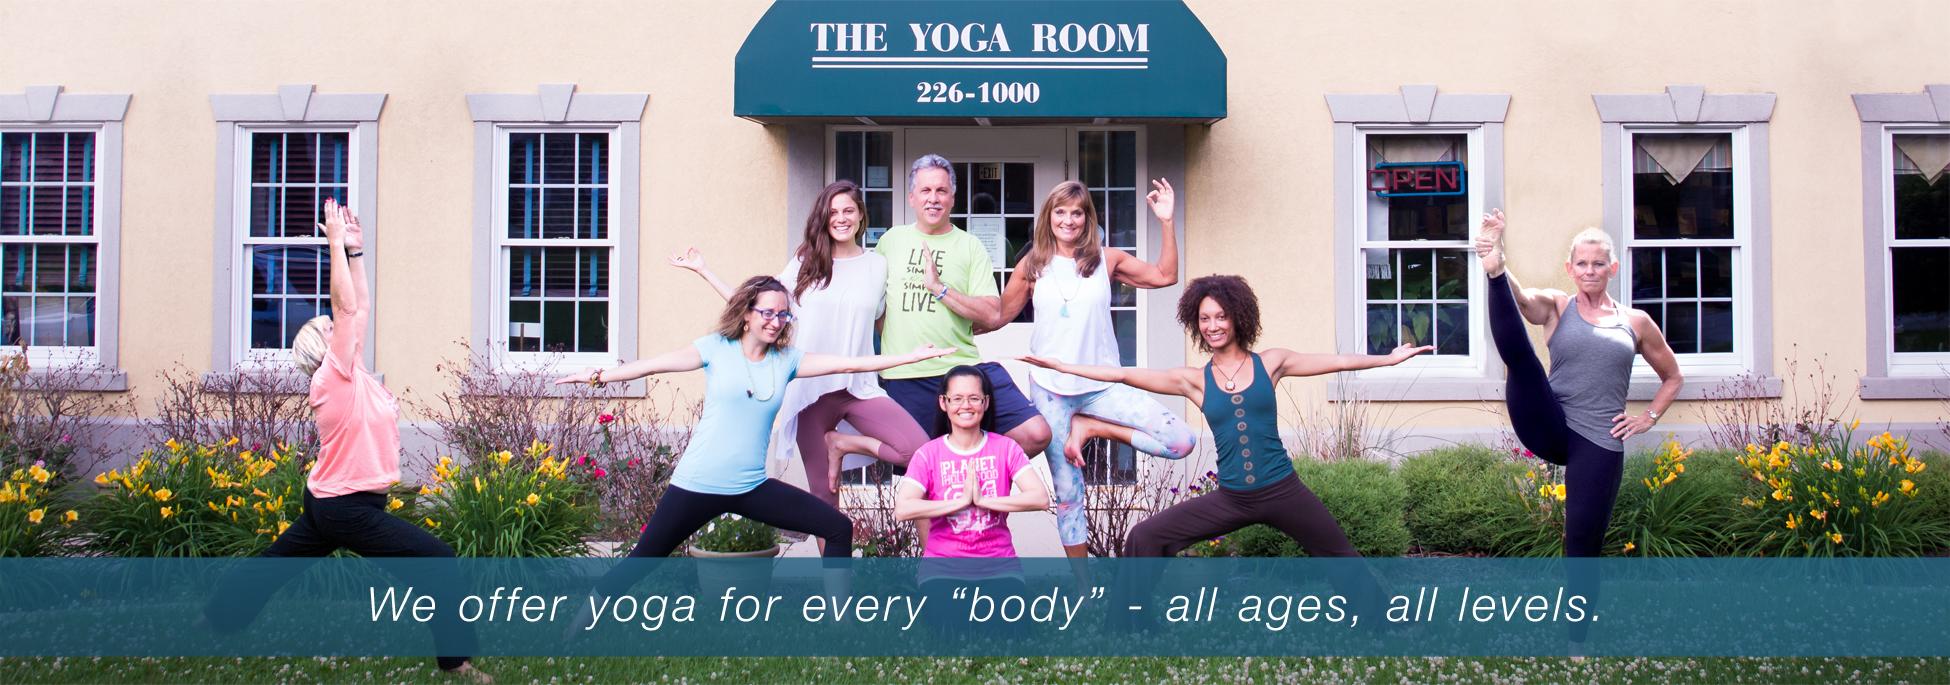 yoga-room-teachers-banner.jpg?quality=100.3015041915160